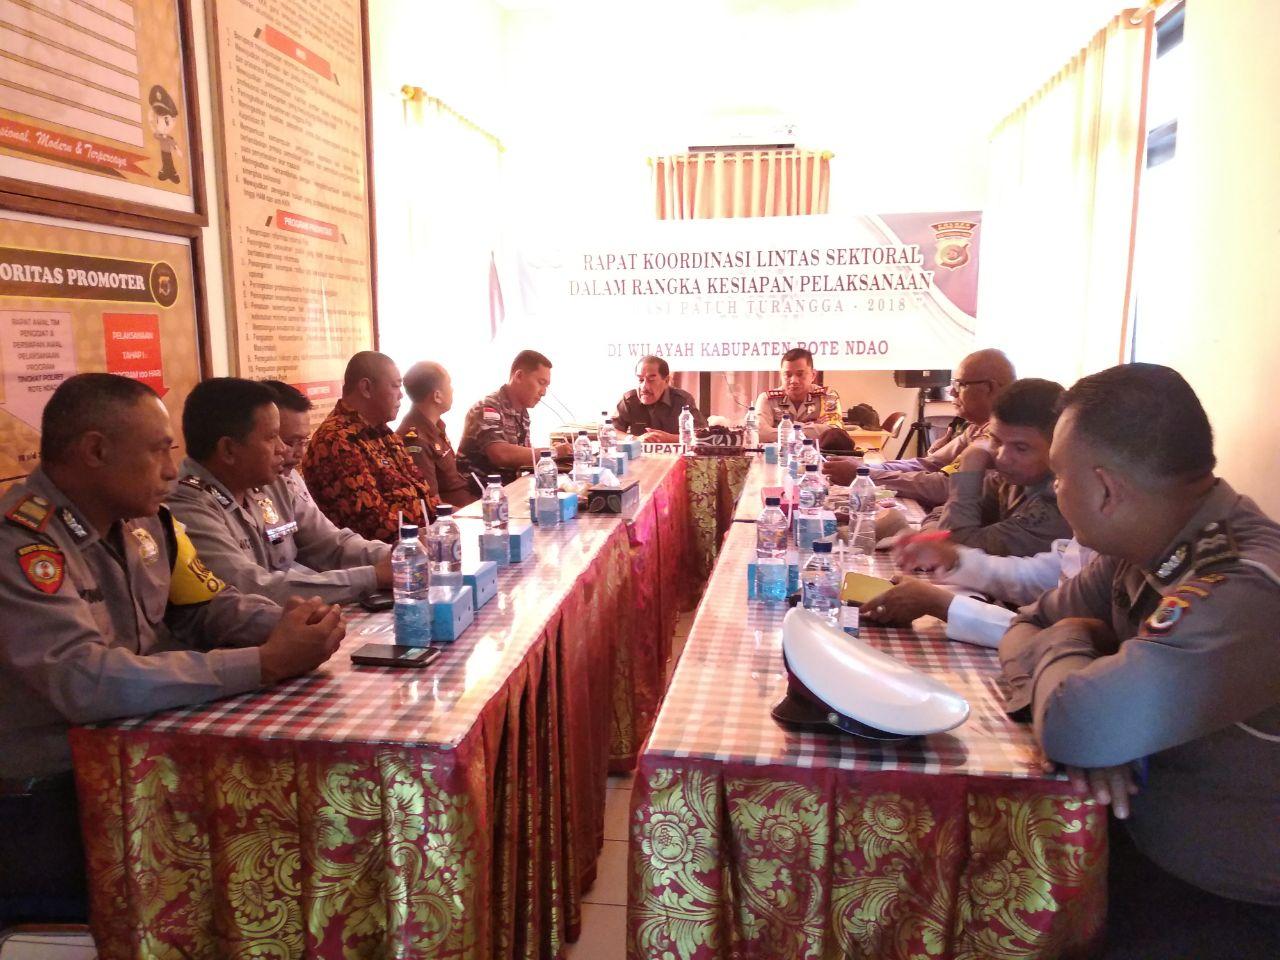 Samakan persepsi dan arah operasi, Polres Rote Ndao laksanakan Rapat Koordinasi